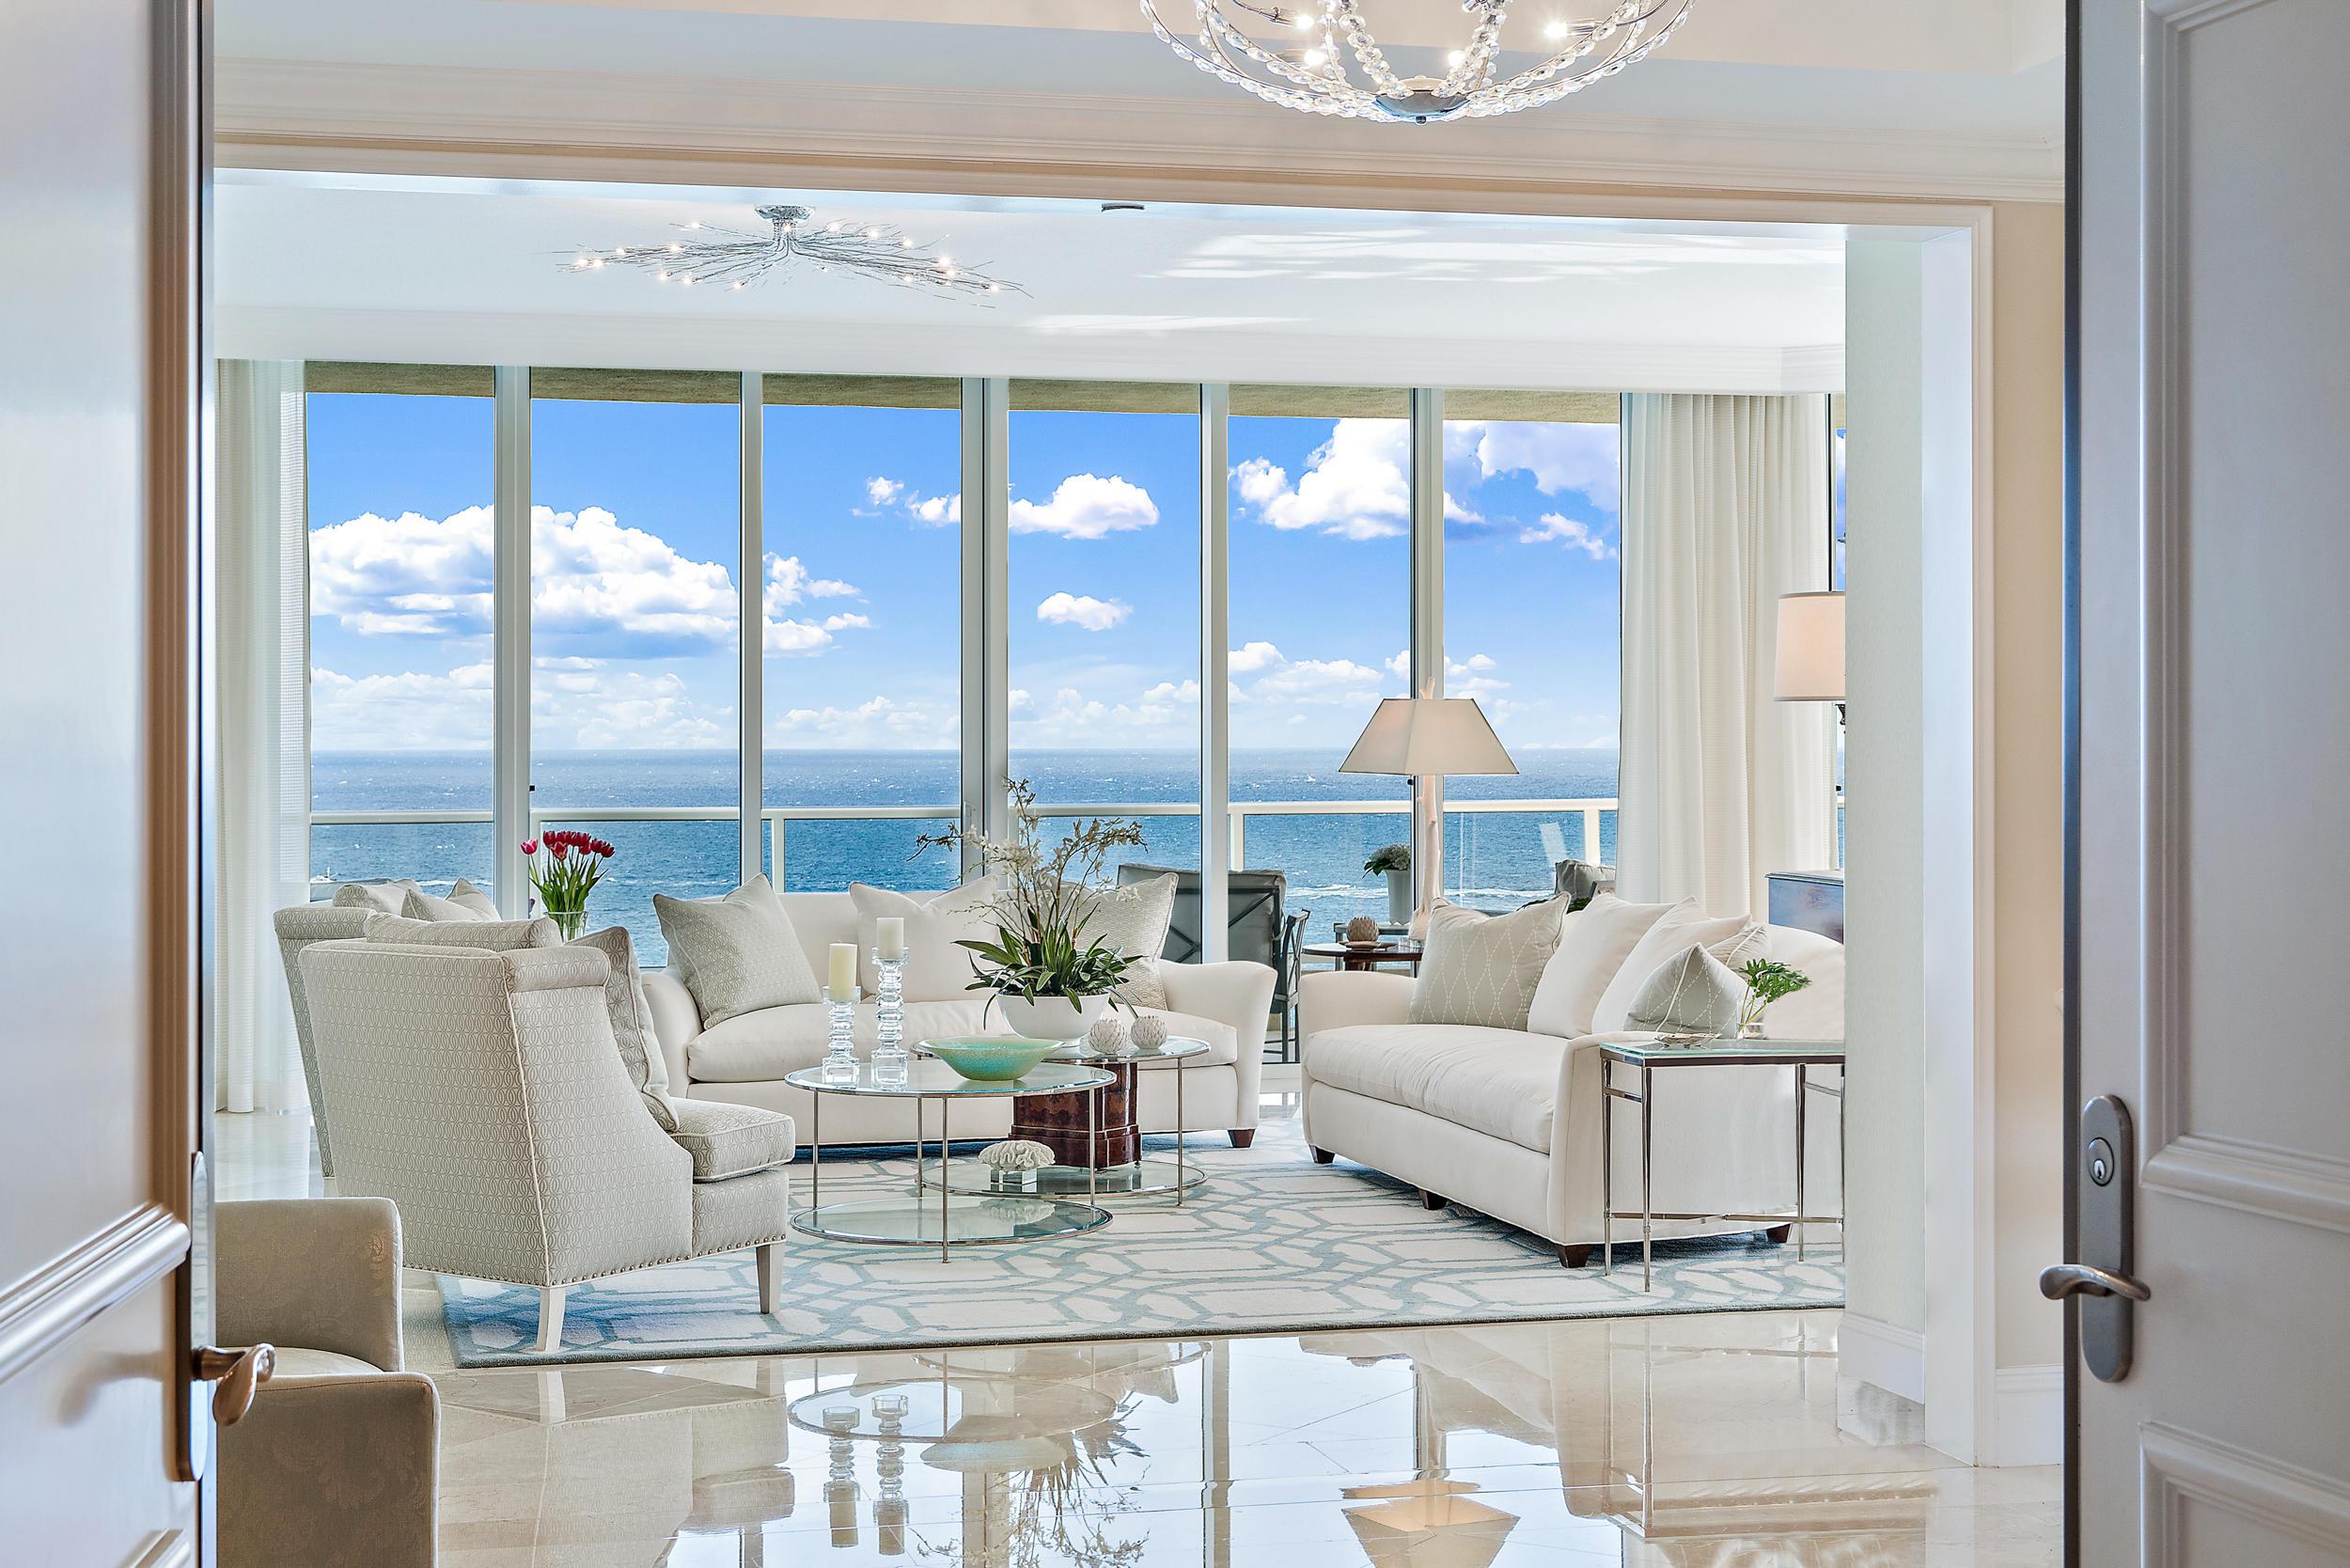 Details for 5050 Ocean Drive N 1602, Singer Island, FL 33404